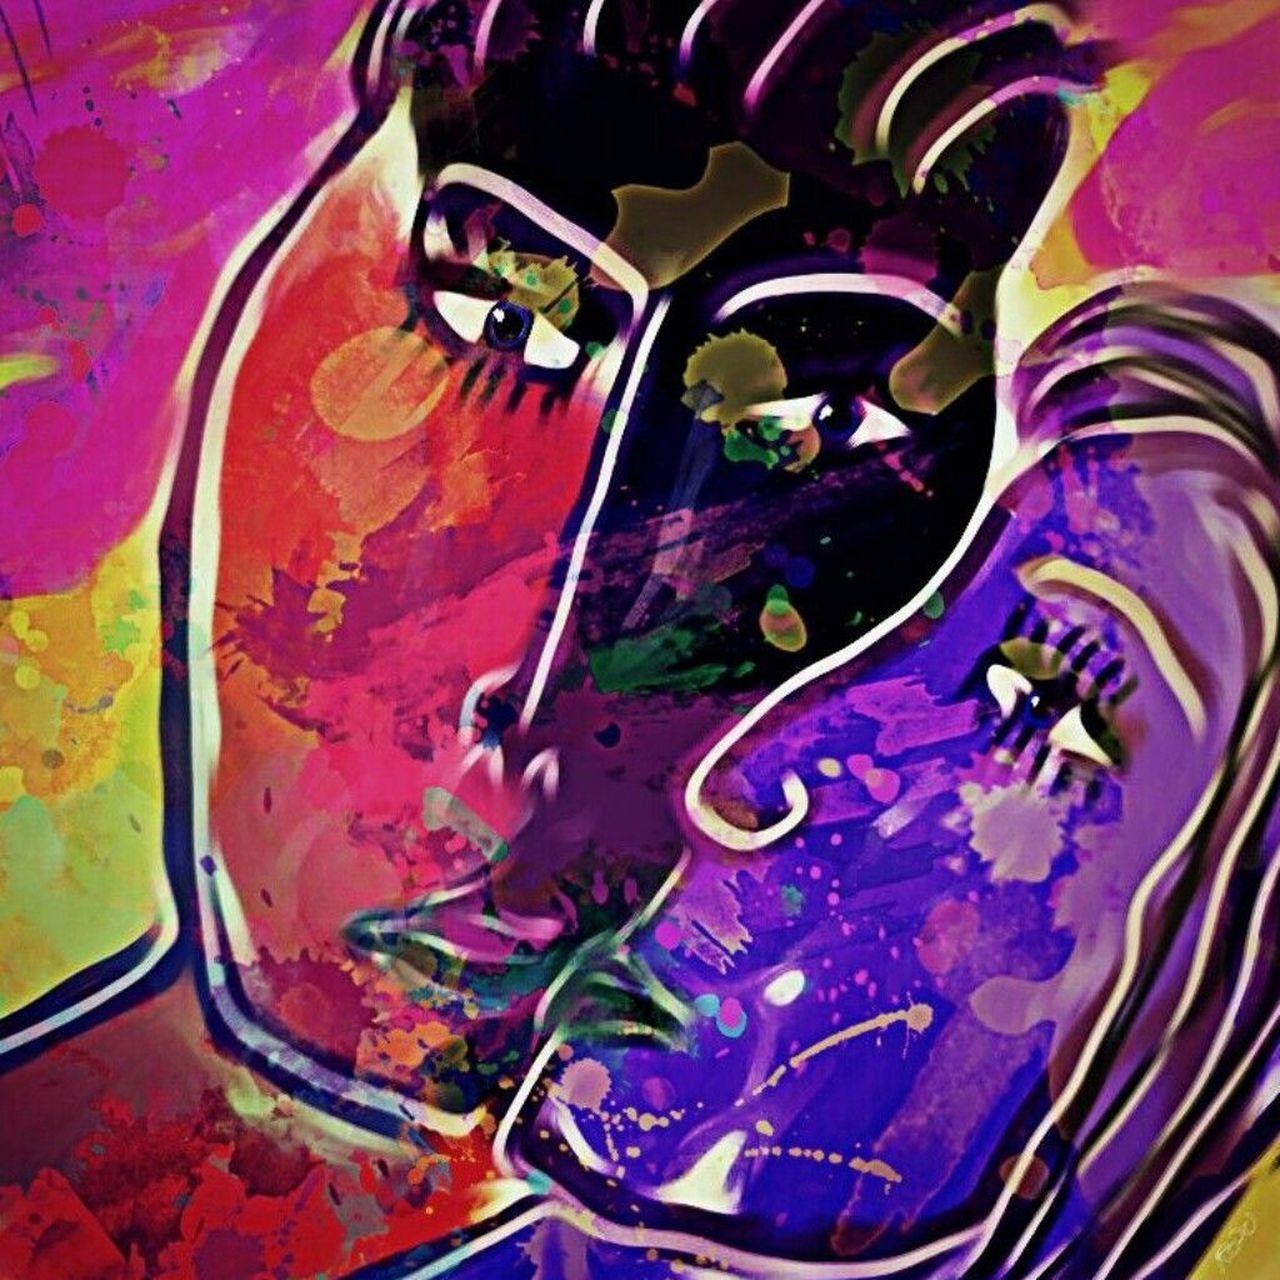 balladen om Fredrik åkare och den söta fröken Cecilia lind Corneliswreeswijk ArtWork Sweden Artforpeace Artistic Artforfreedom Painted Image Creativity Love Arts Rojo Art And Craft Make Love Not War Check This Out Art, Drawing, Creativity Peace Fine Art Art Hello World Fineart Kindness Colorful